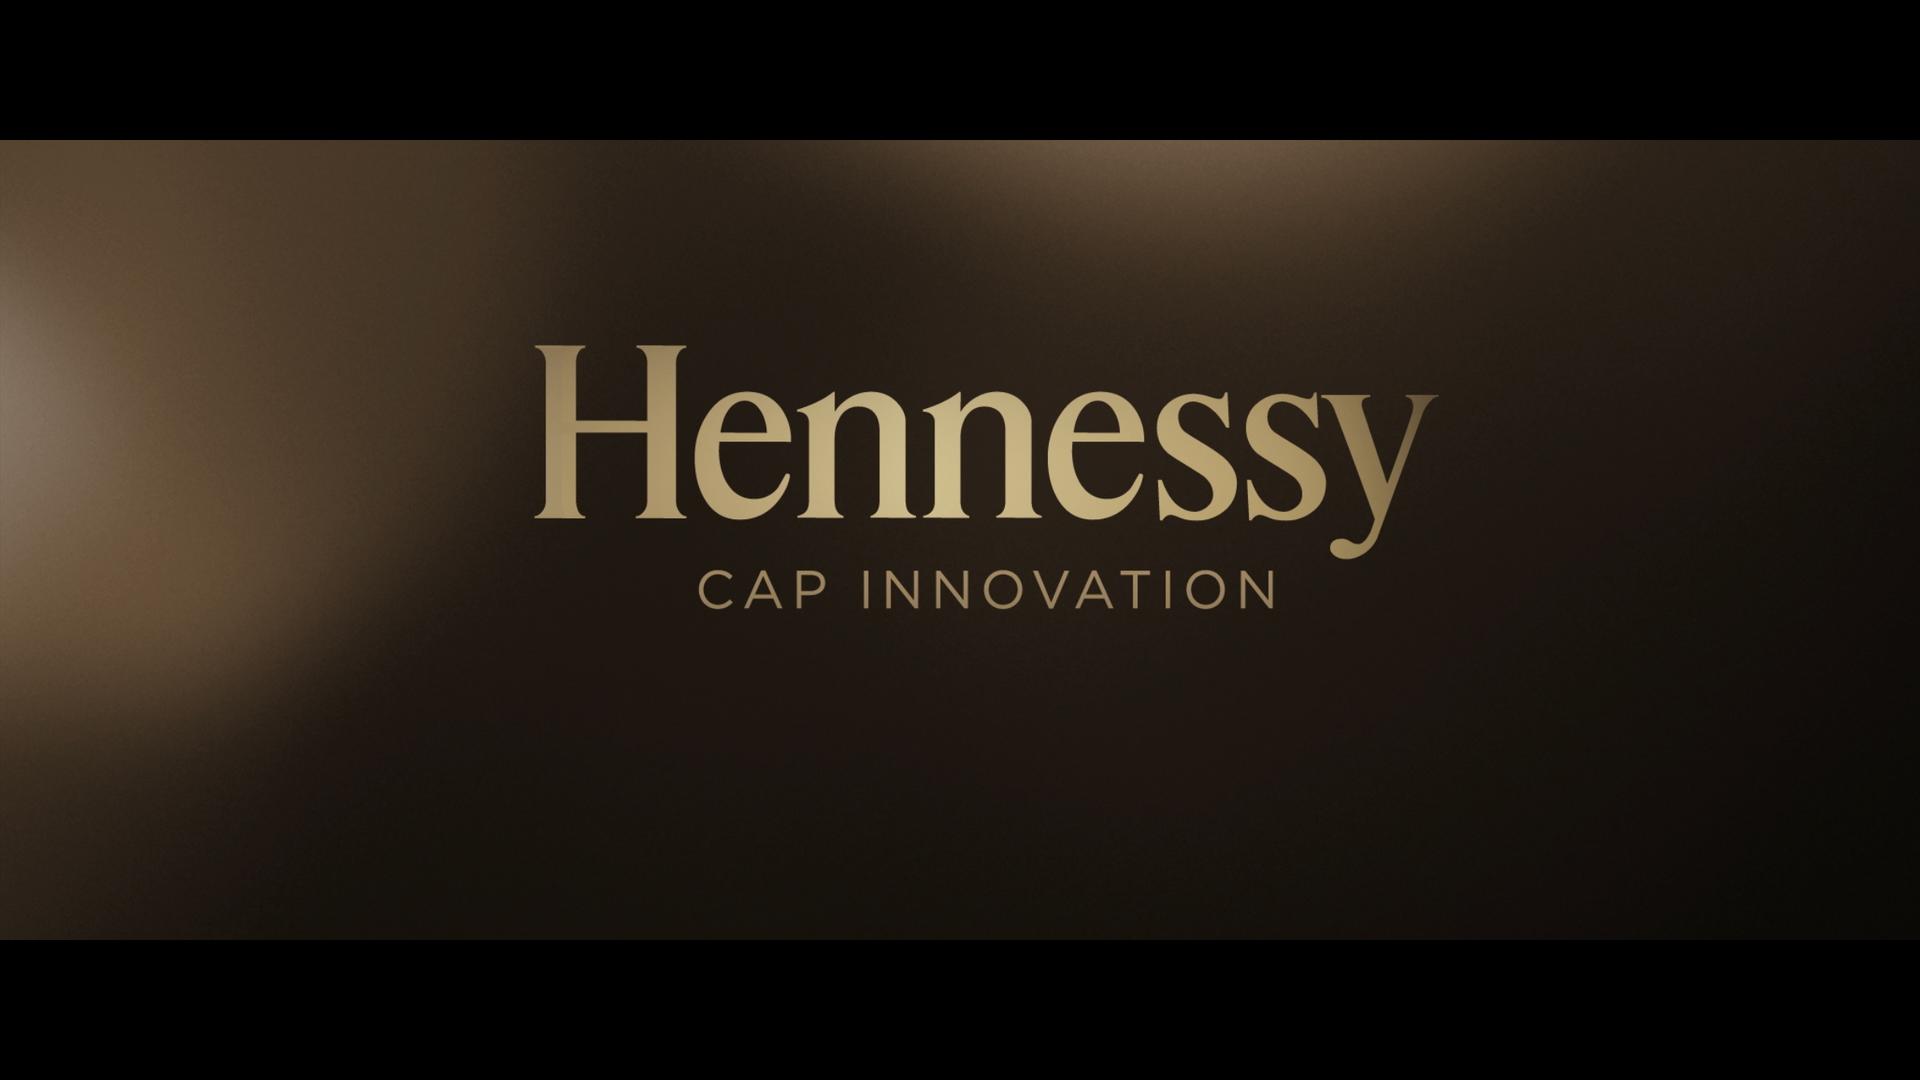 http://ftptwo.twosevenlab.com/site_twoseven/html5_videos/HENNESSY_CAP_INNOVATION_19s.jpg